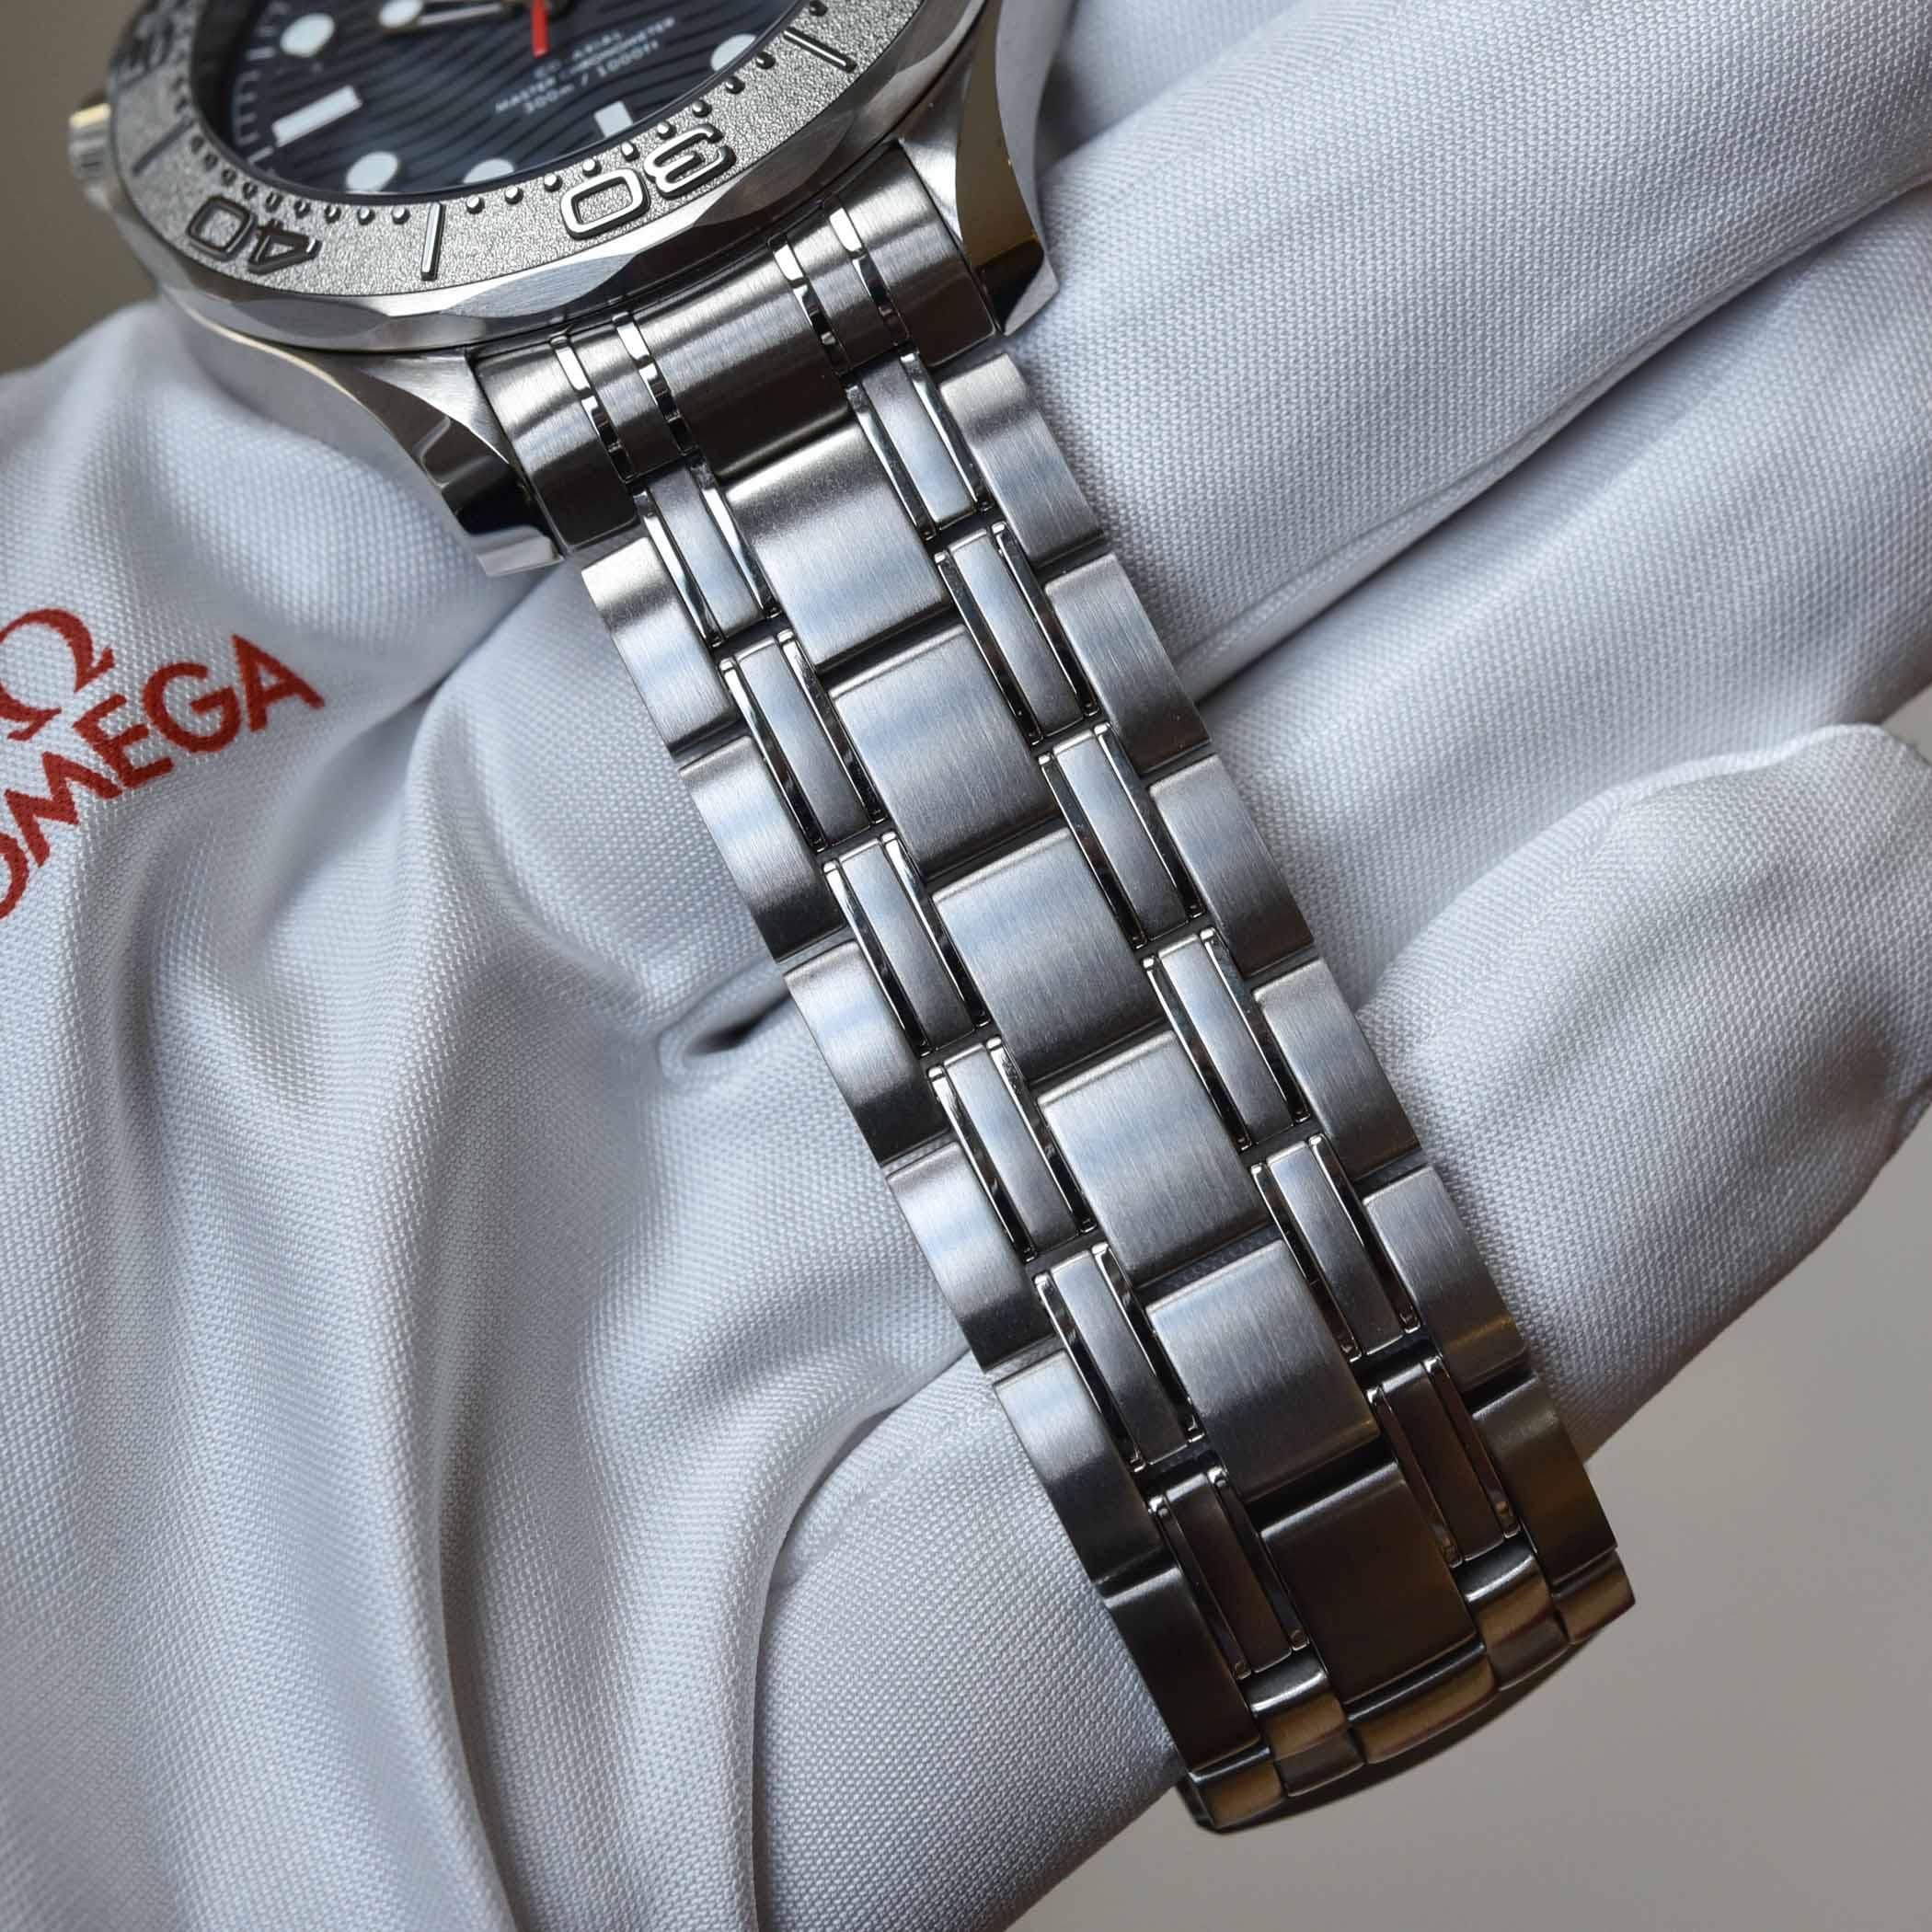 Omega Seamaster Diver 300M Nekton Edition 210.30.42.20.01.002